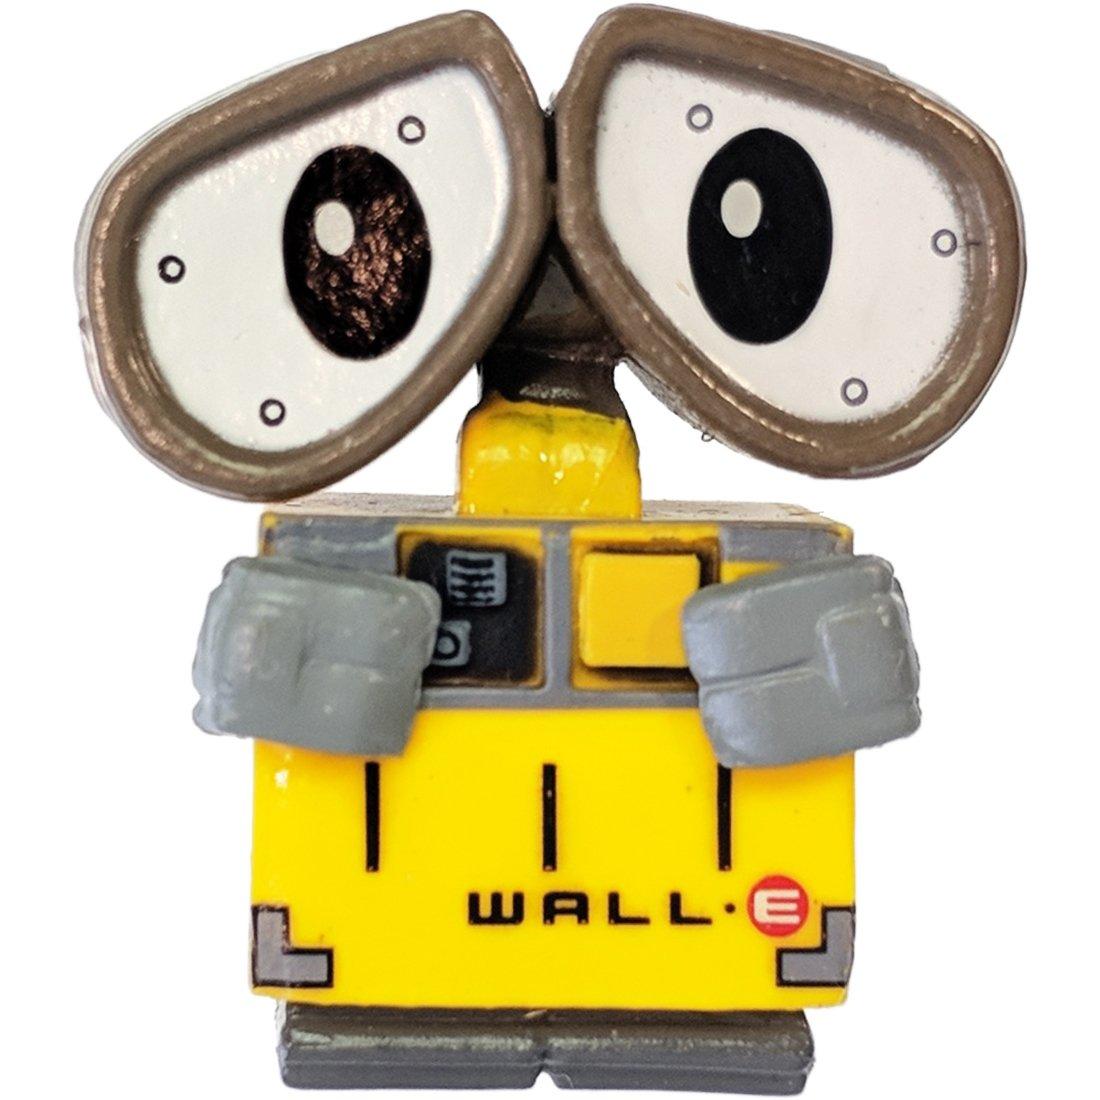 Amazon.com: Funko Wall-E: Disney Pixar – Wall-E X tamaño ...